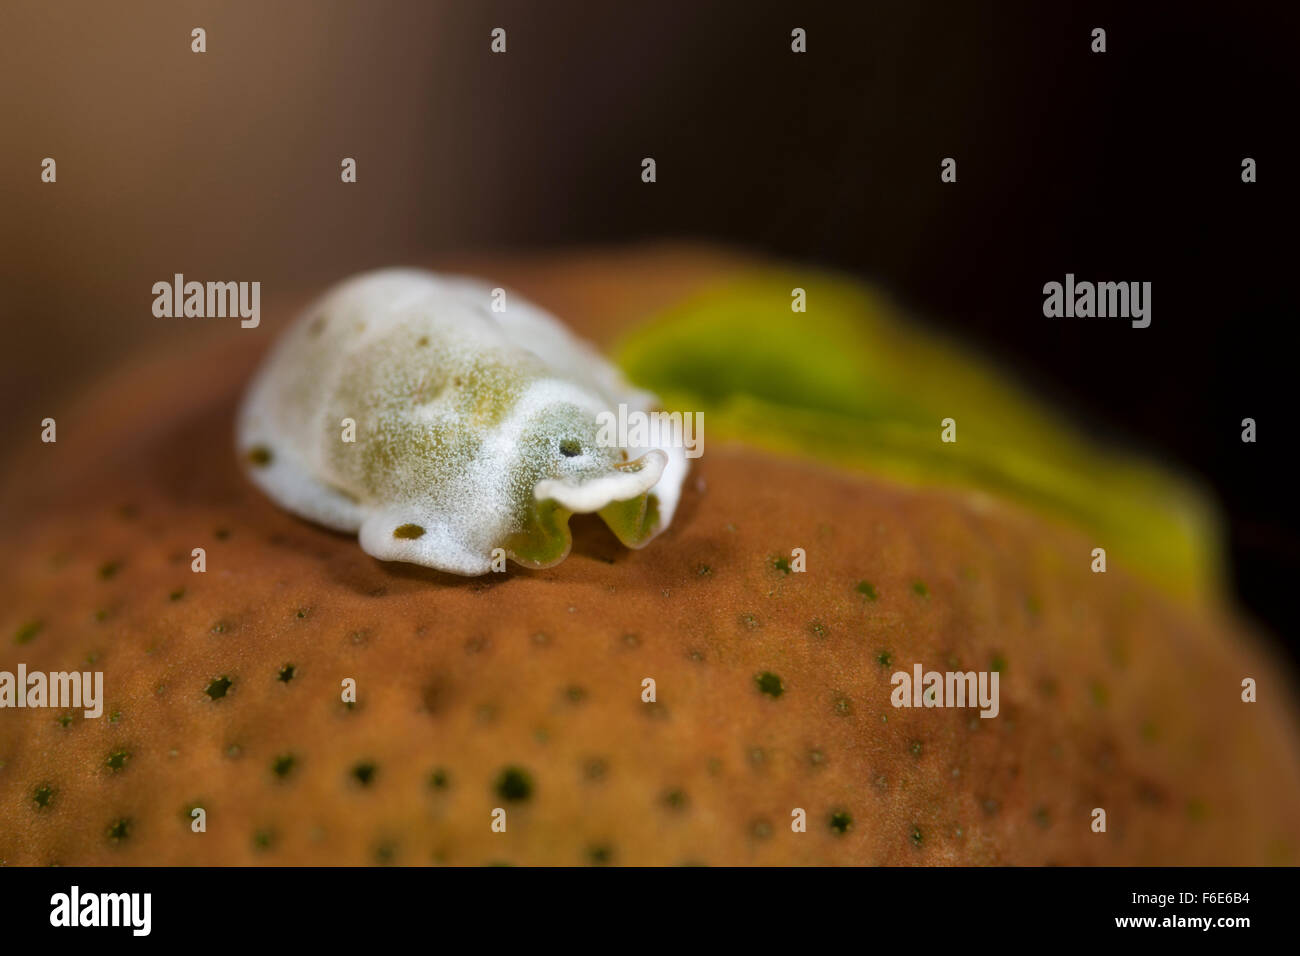 Flatworm on Sea Squirt, Ascidiophilla alba, Komodo, Indonesia - Stock Image